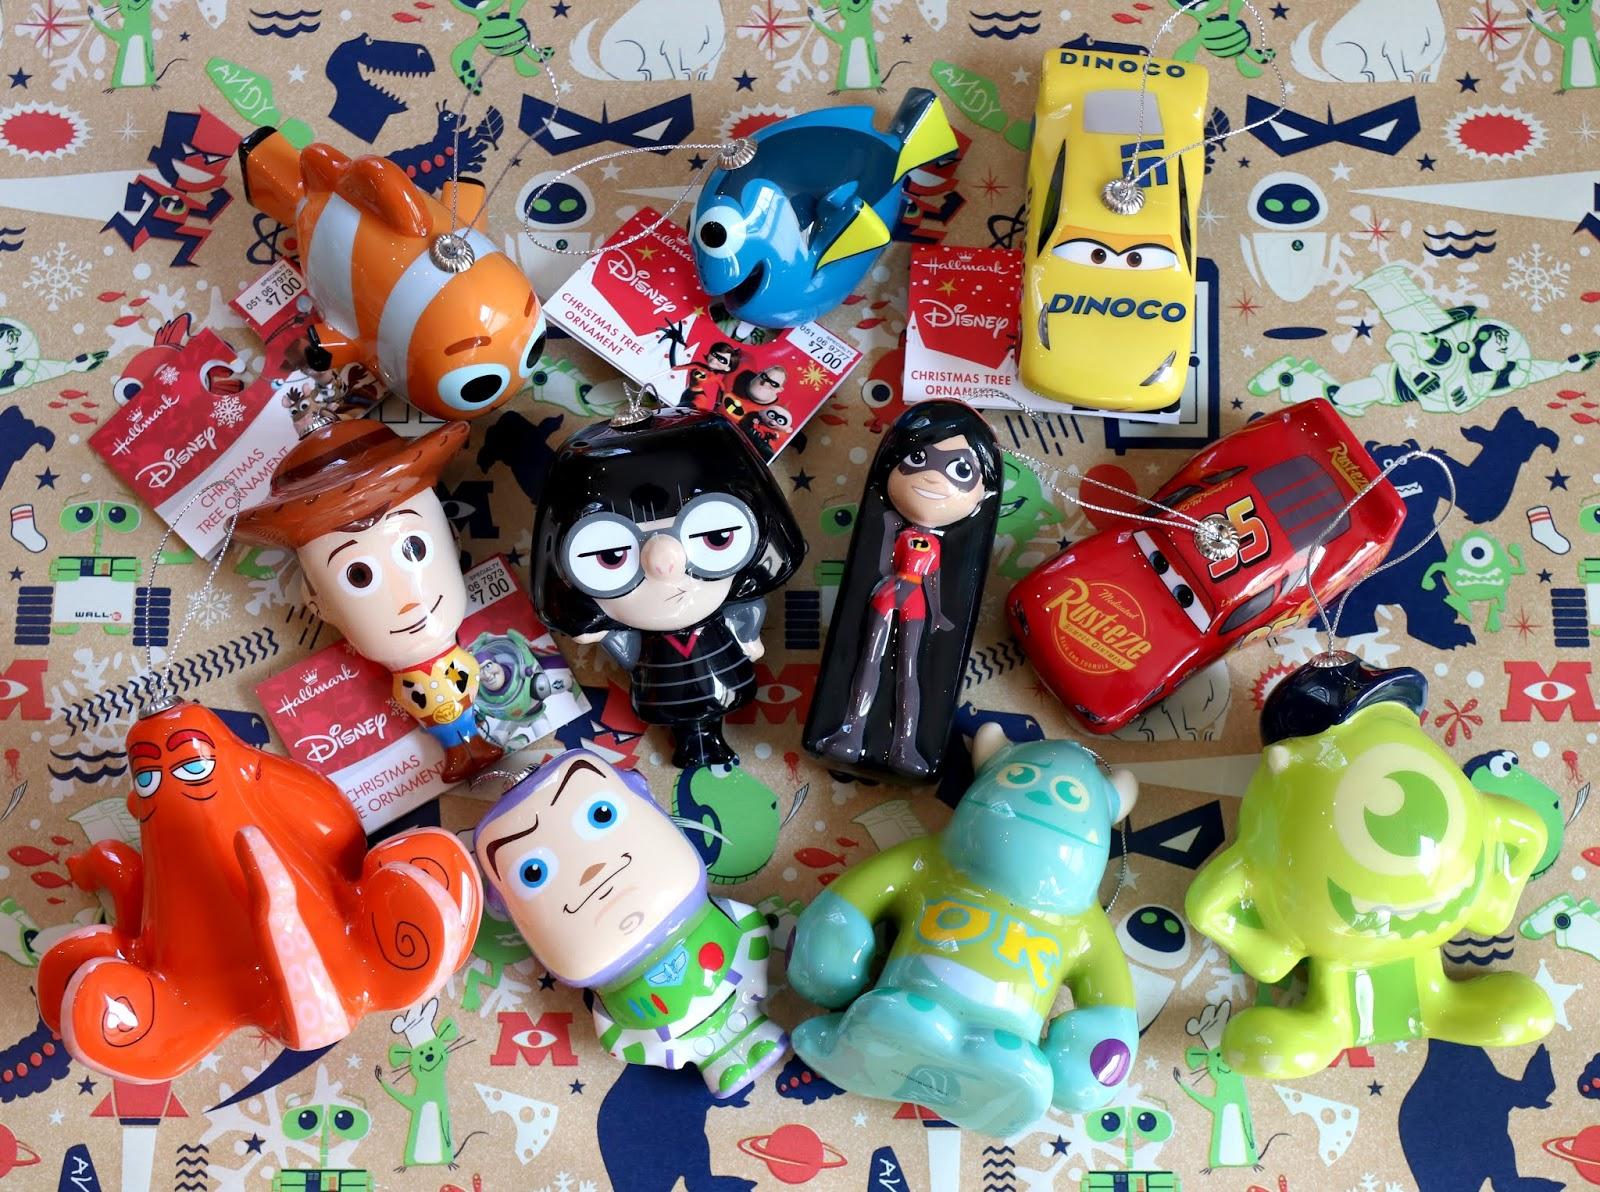 pixar hallmark target decoupage ornaments